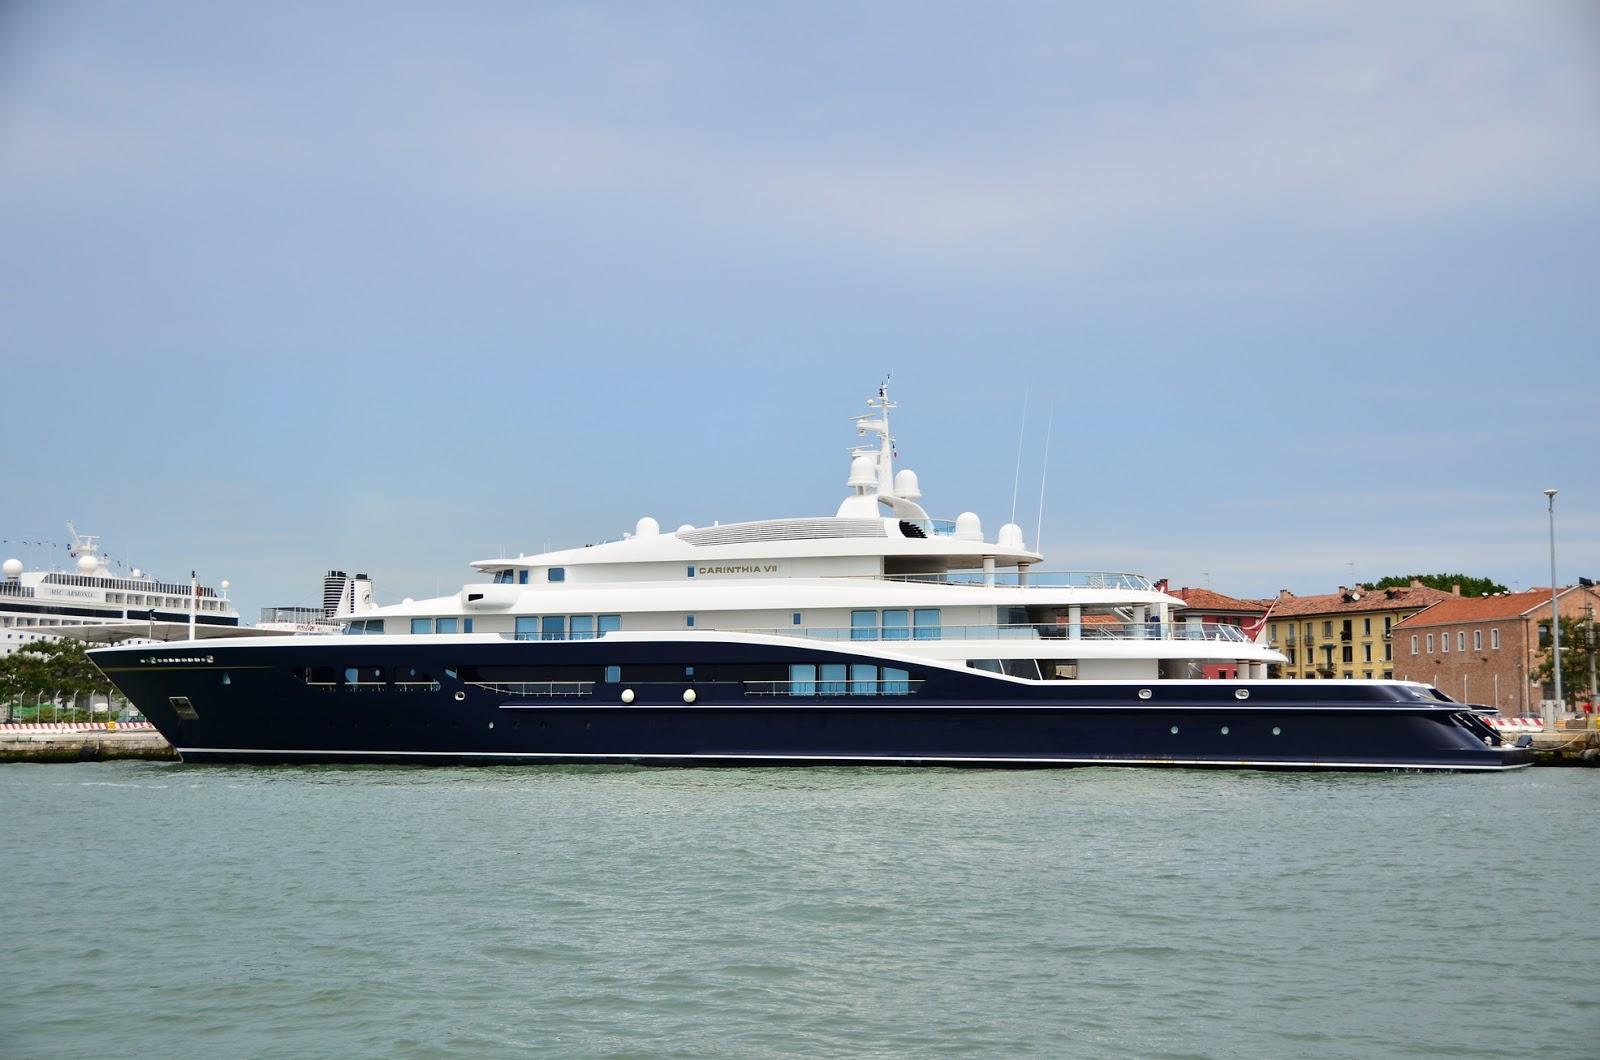 Superyacht CARINTHIA VII